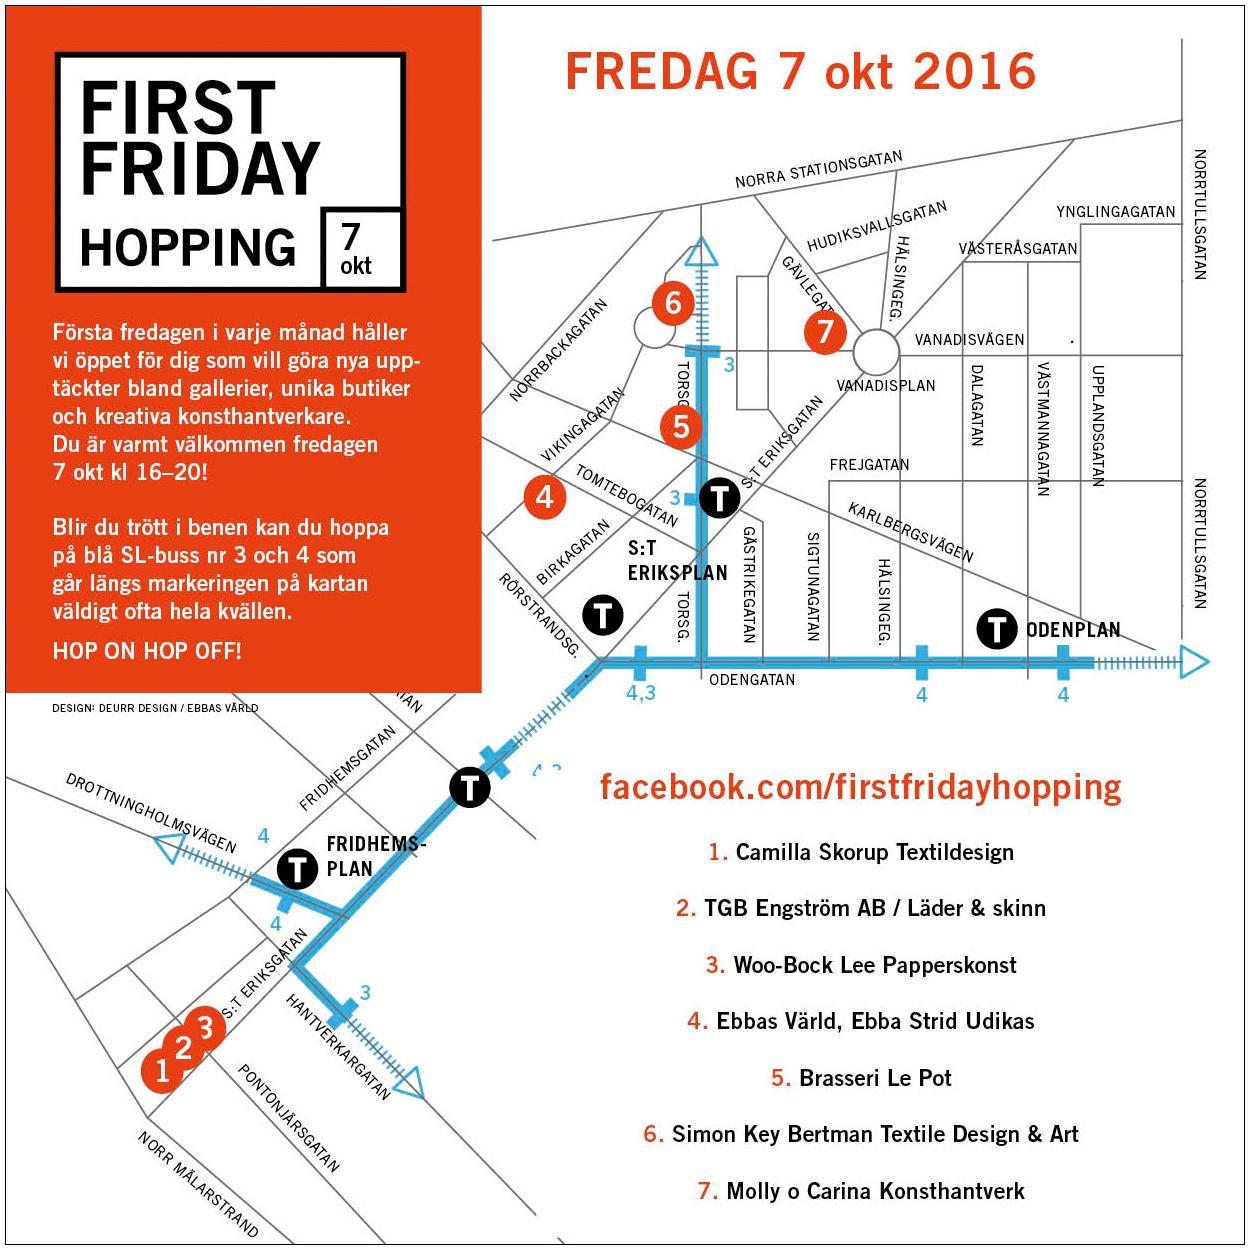 first_friday_hopping_karta_20161007